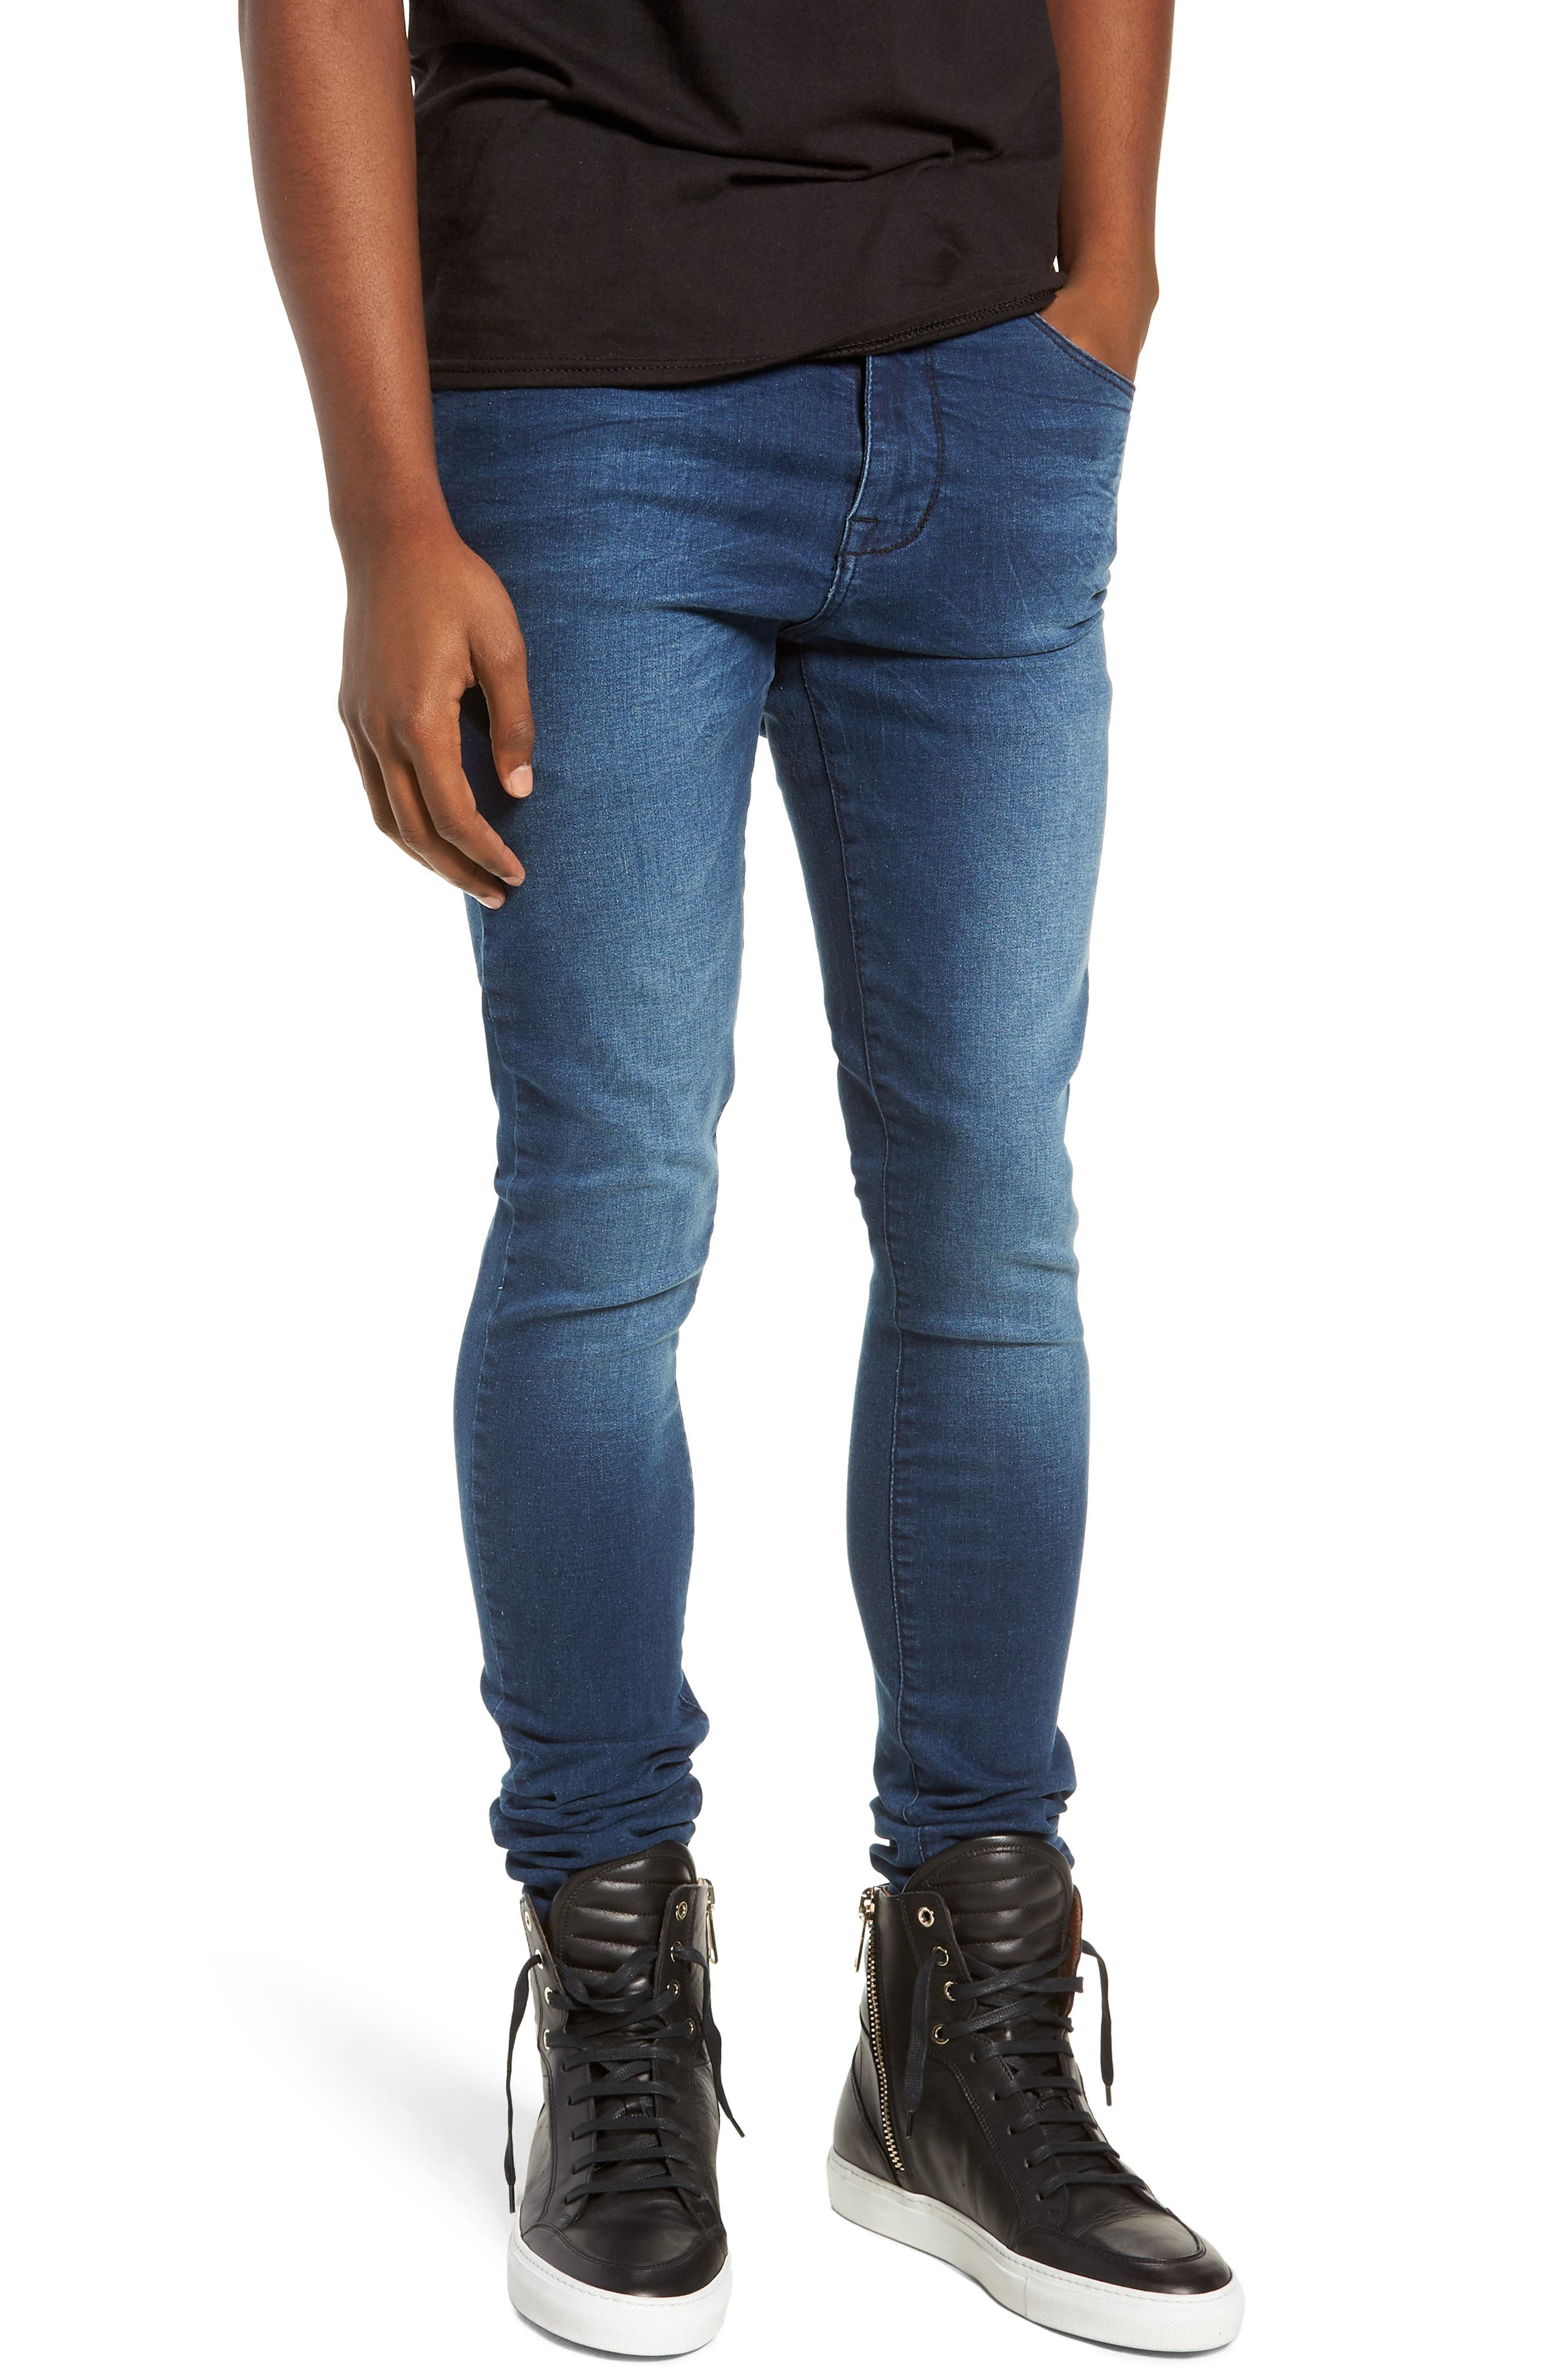 Leroy Skinny Fit Jeans,                             Main thumbnail 1, color,                             WORN DARK BLUE